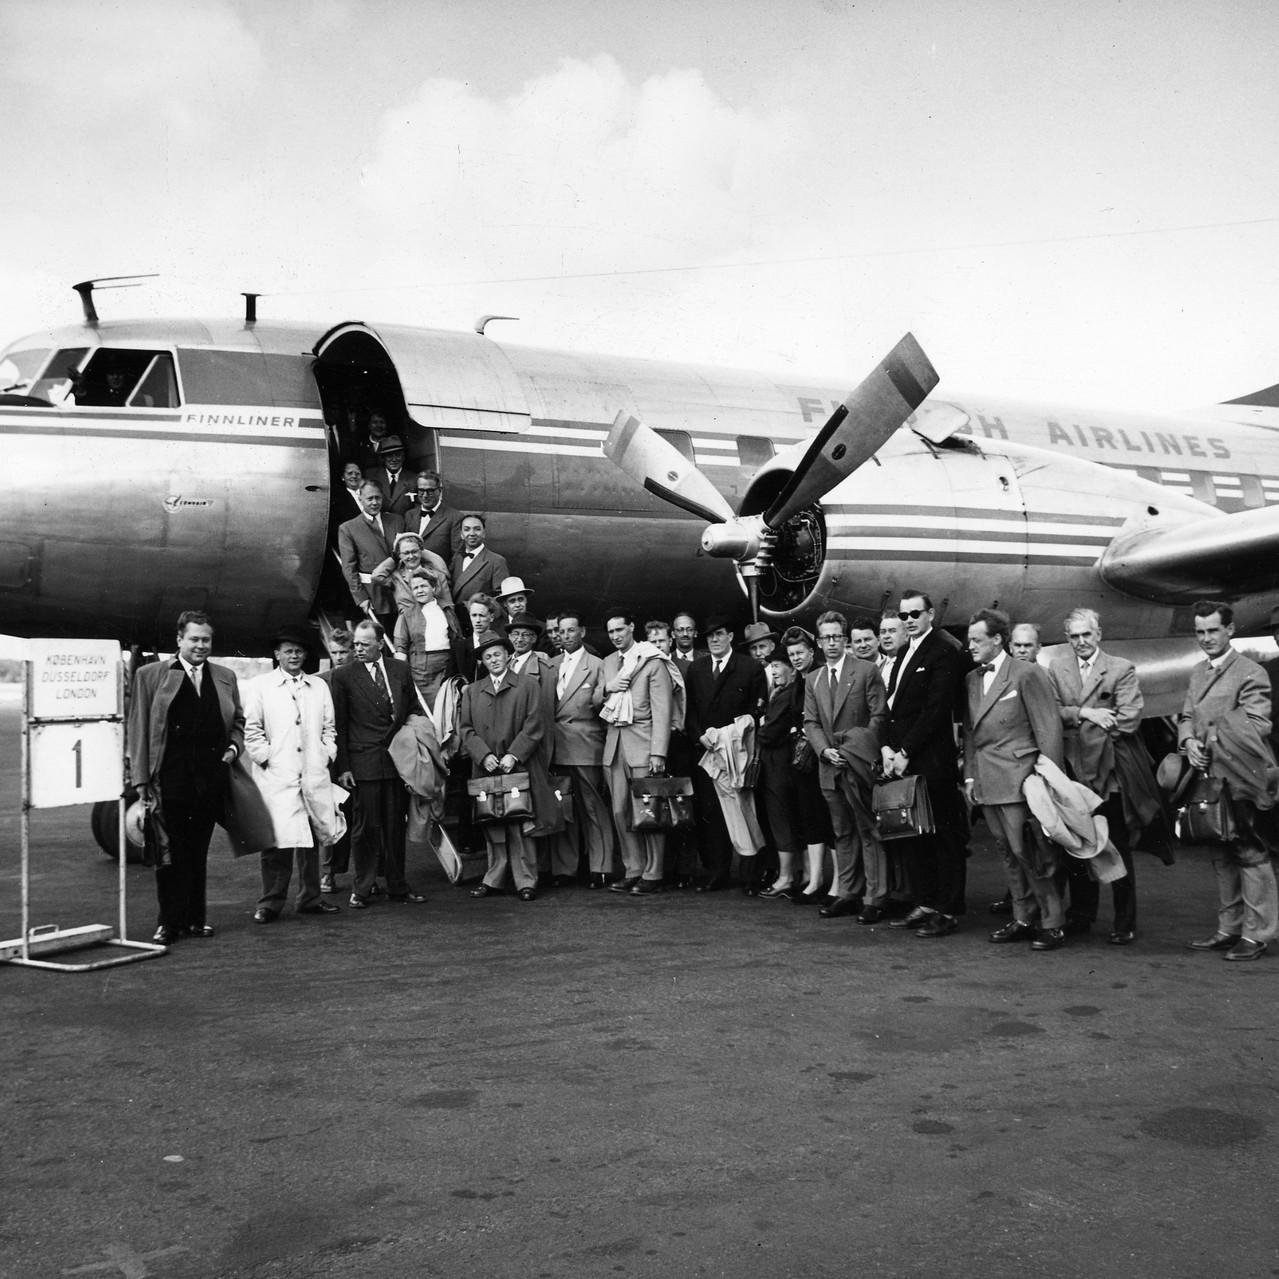 000_inauguration flight to London1954_Fi